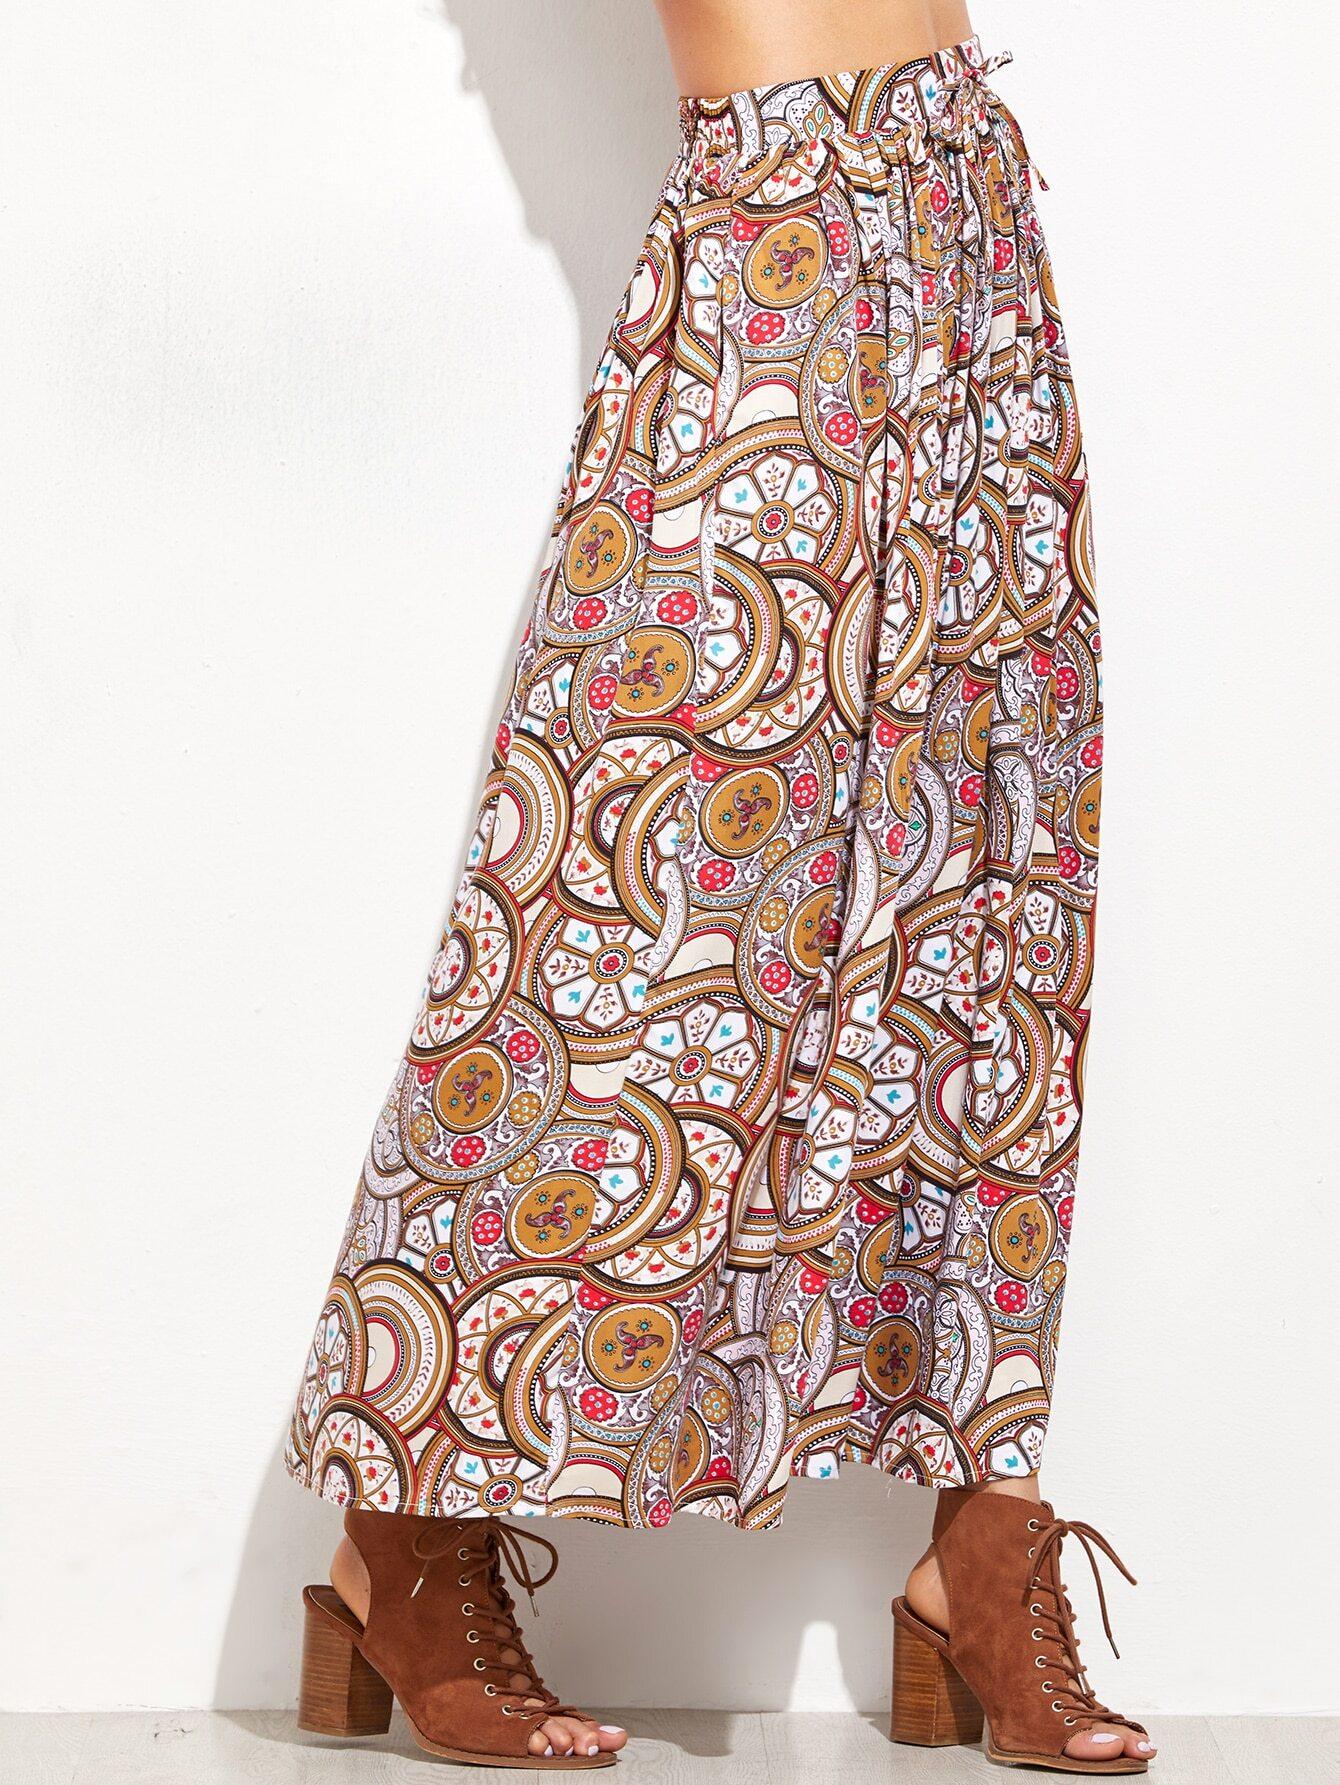 SheIn Khaki Vintage Circle Print Drawstring Waist Skirt